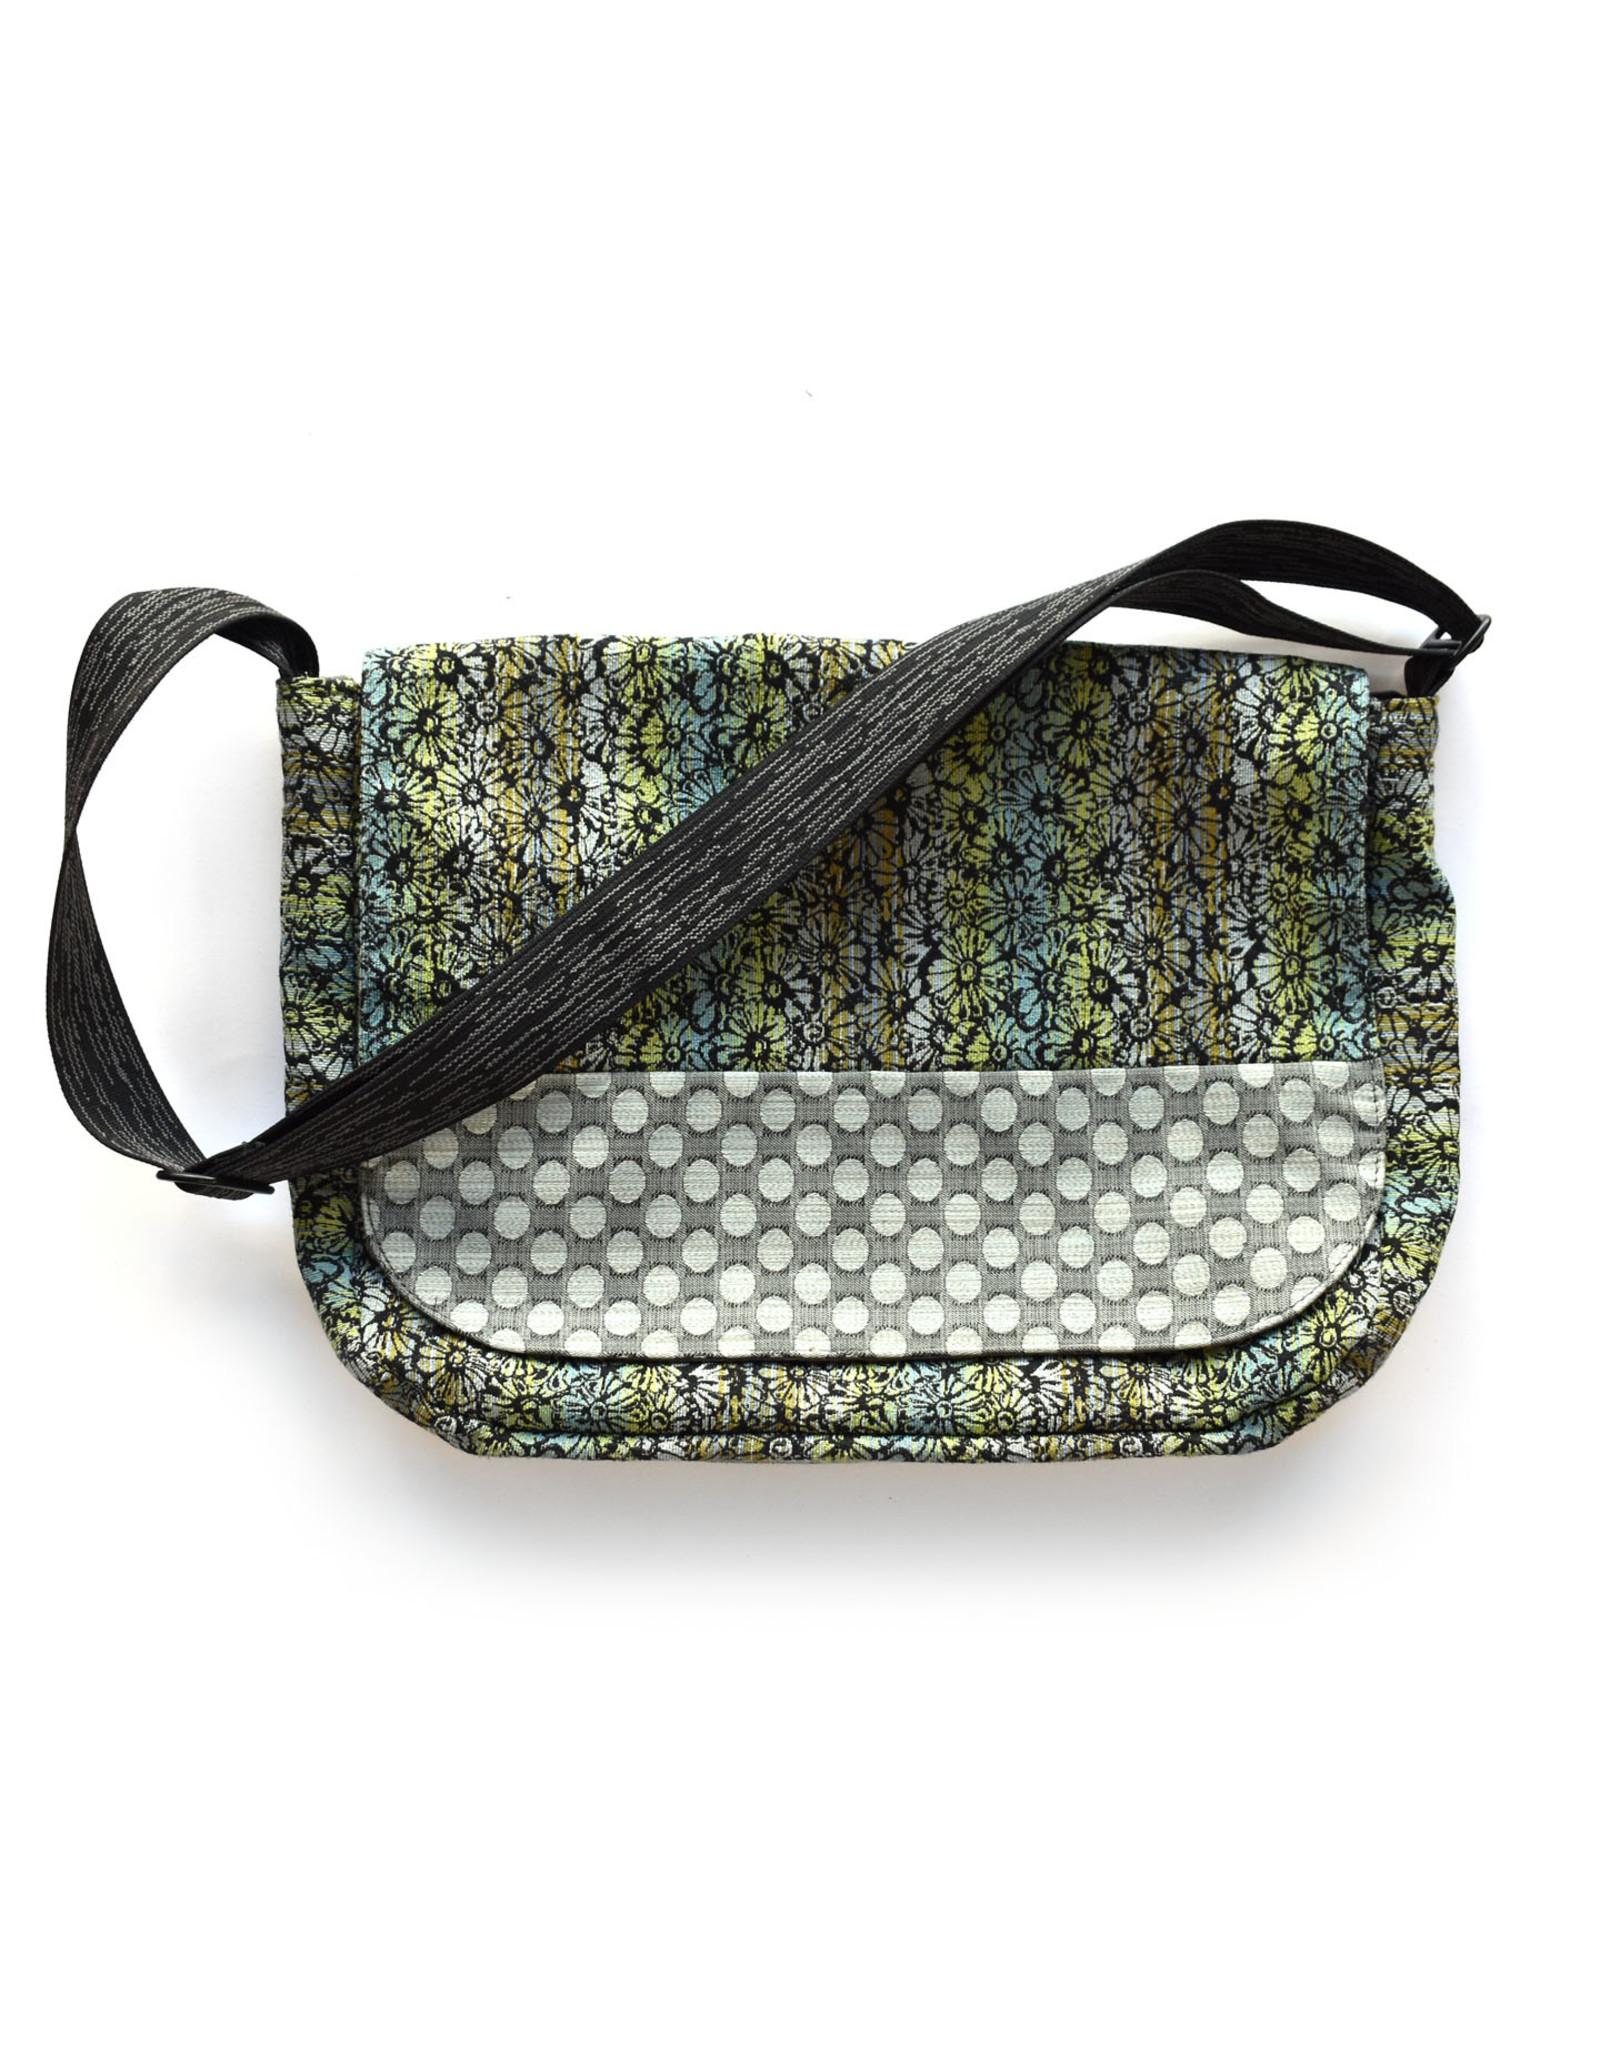 Metro Messenger Bag - Flower Wash